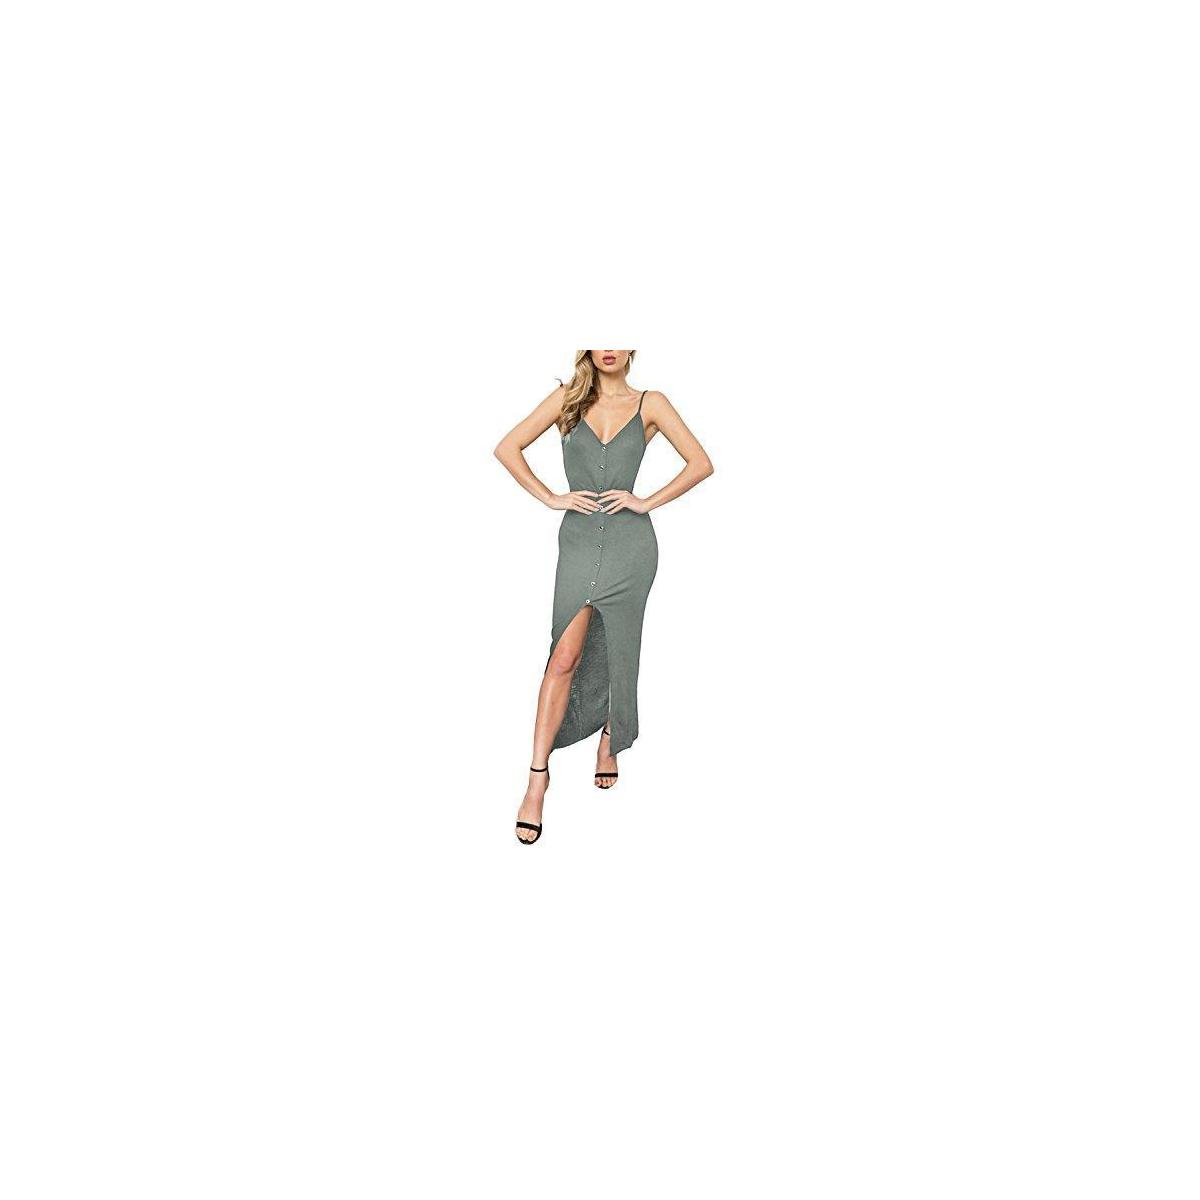 Women's Summer Spaghetti Strap Button Down Evening Party Bodycon Mermaid Midi Dress